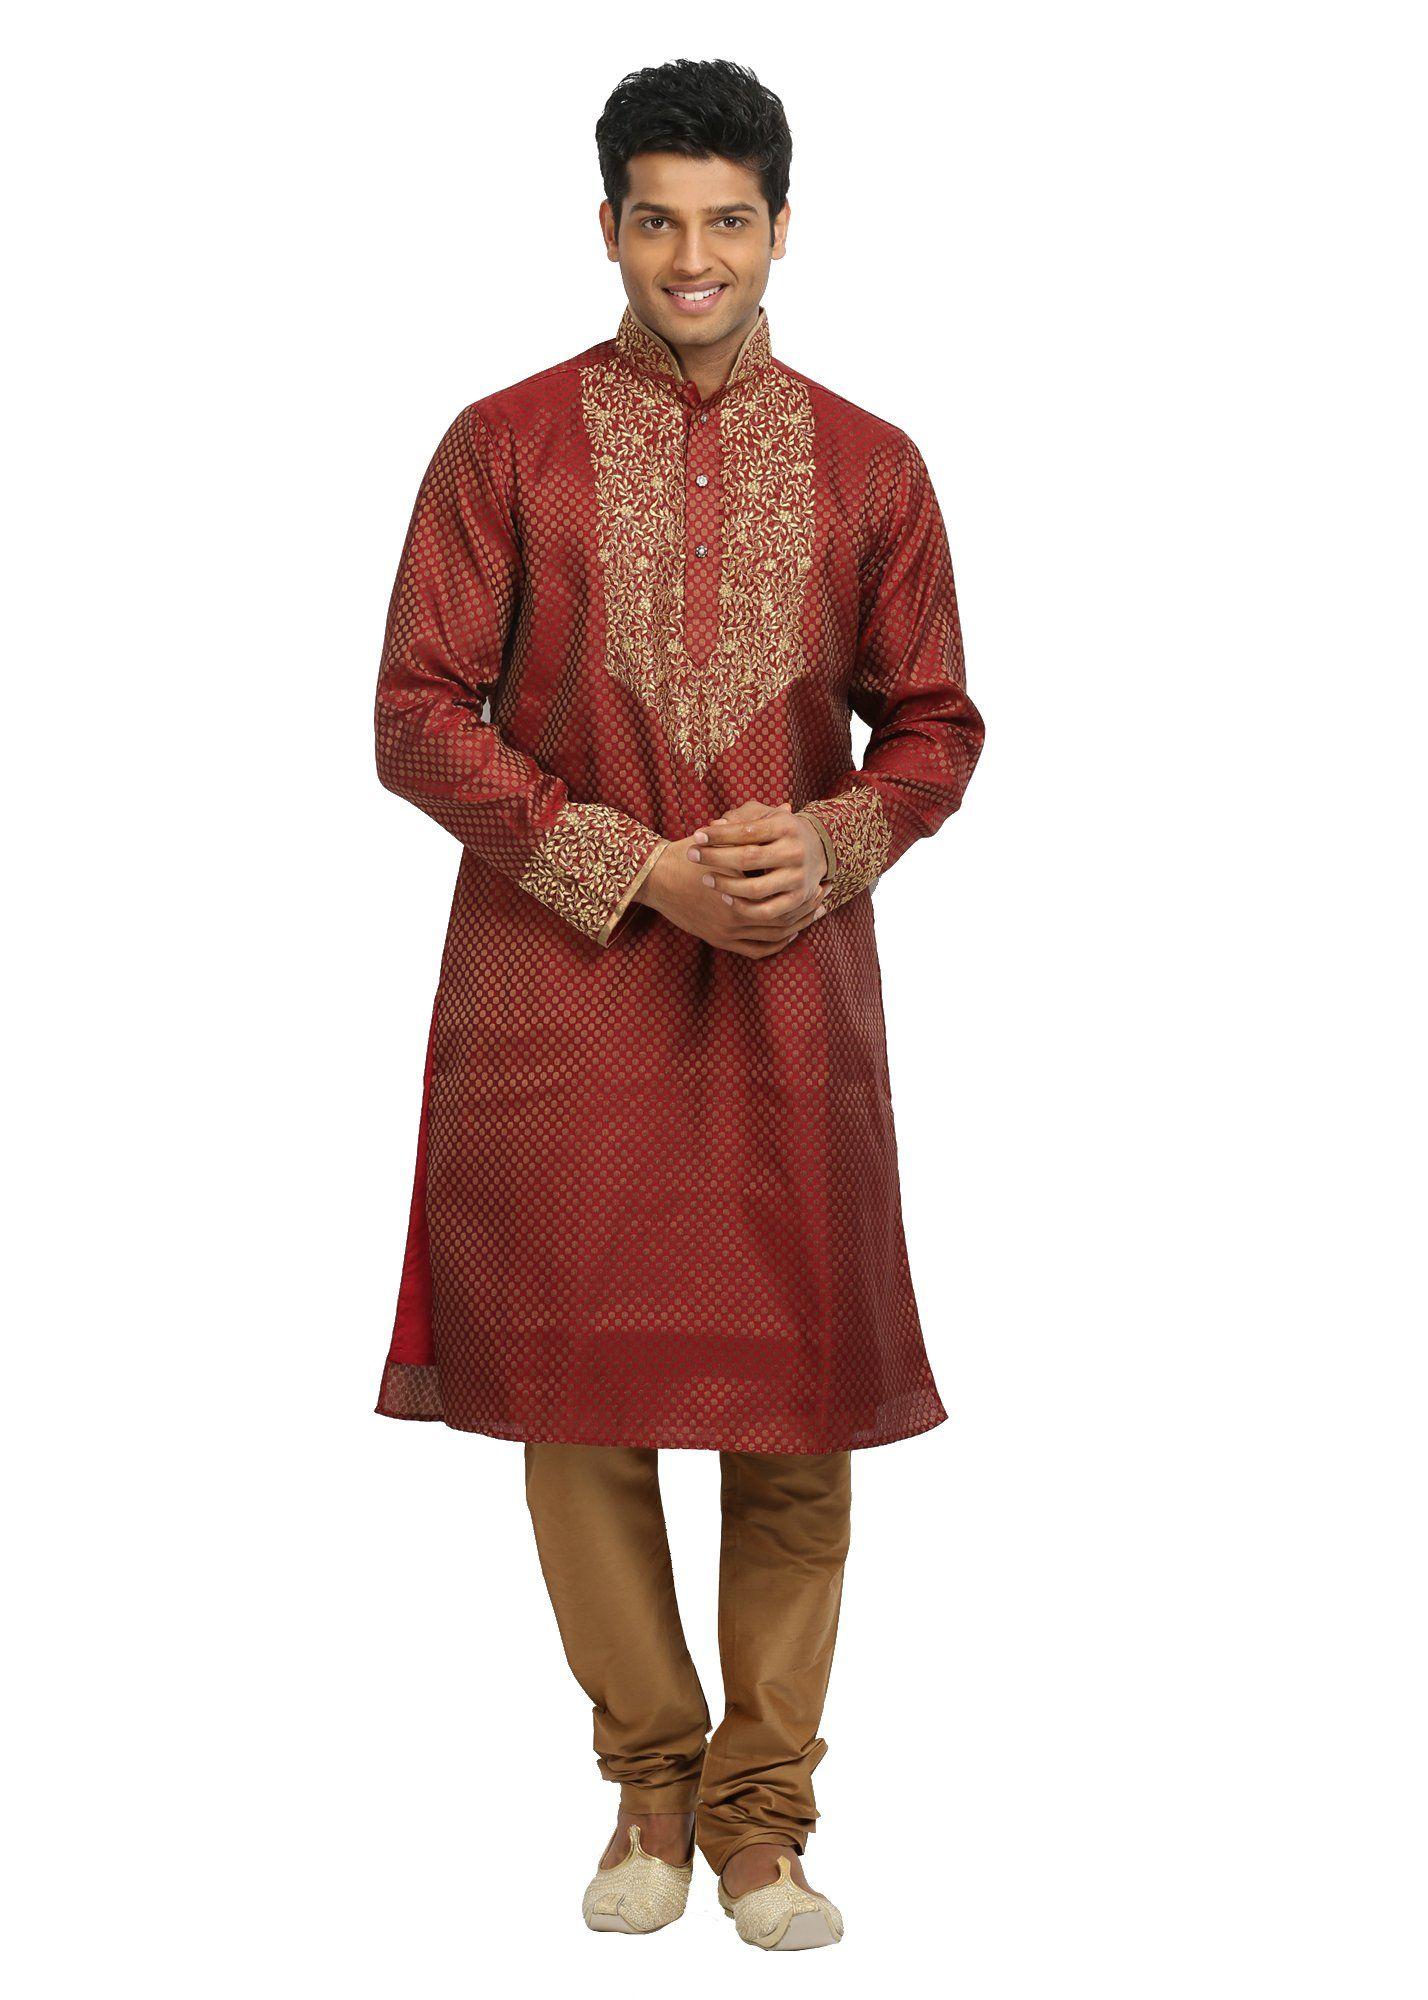 Rust indian wedding kurta pajama sherwani indian ethnic wear for